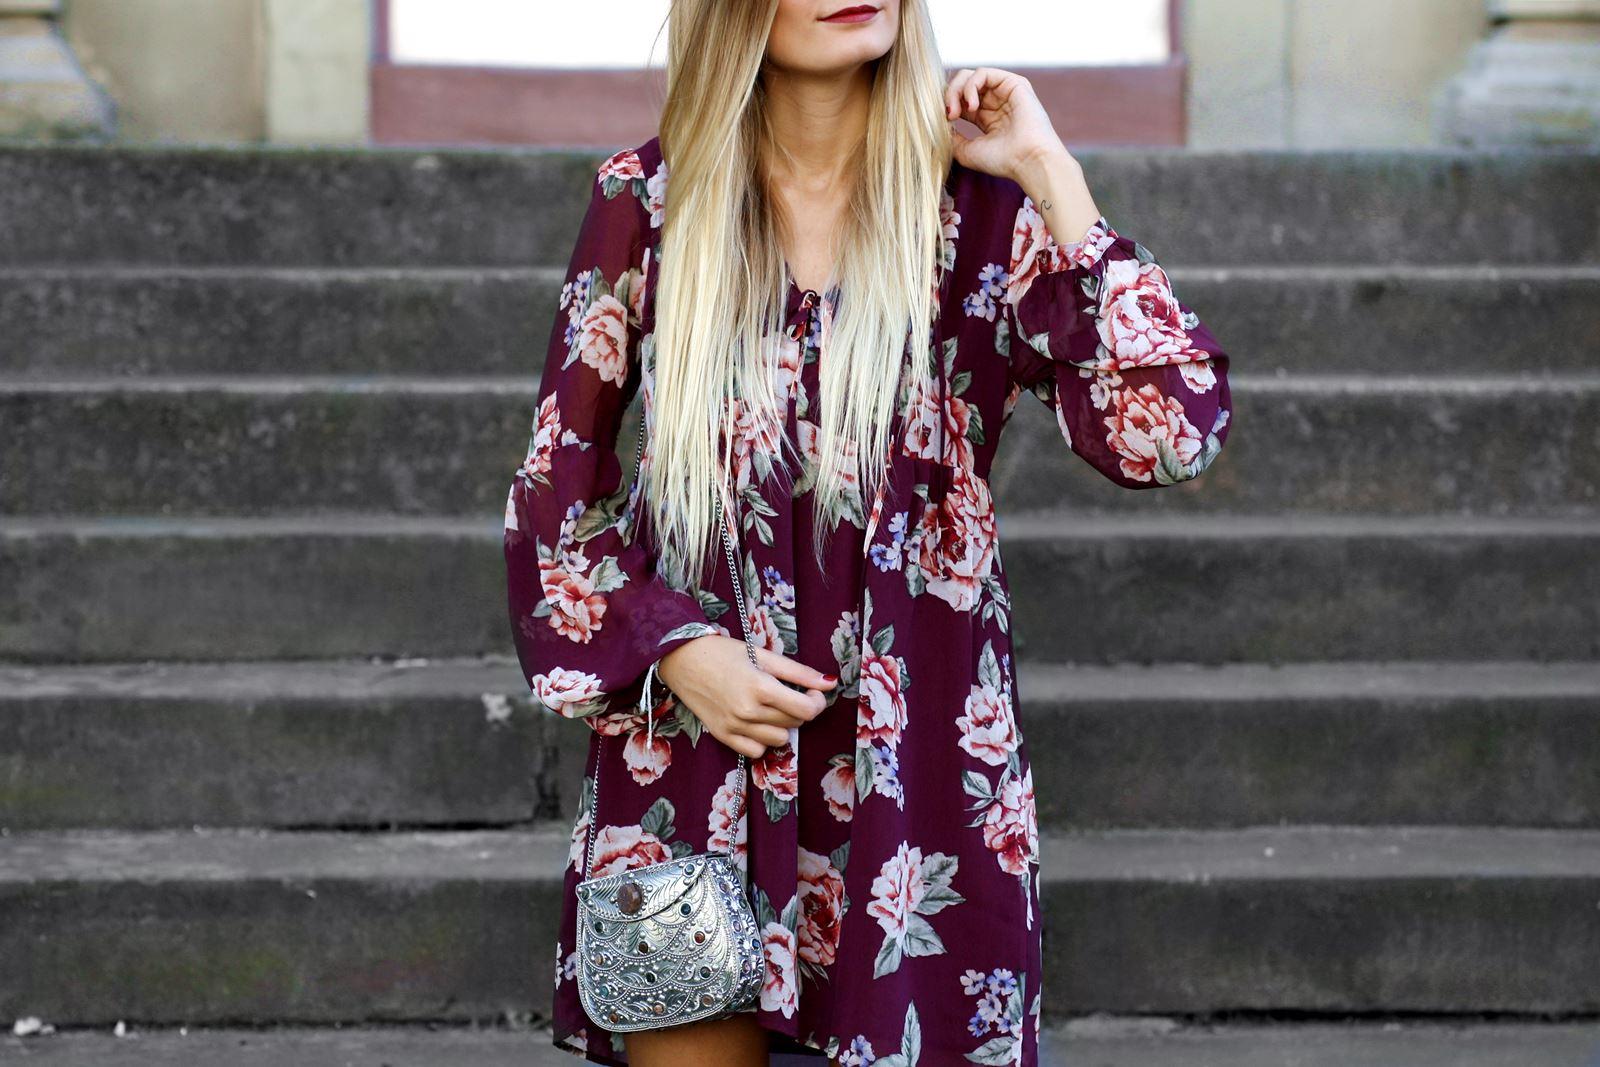 modeblog-german-fashion-blog-outfit-stiefeletten-rotes-blumenkleid-4